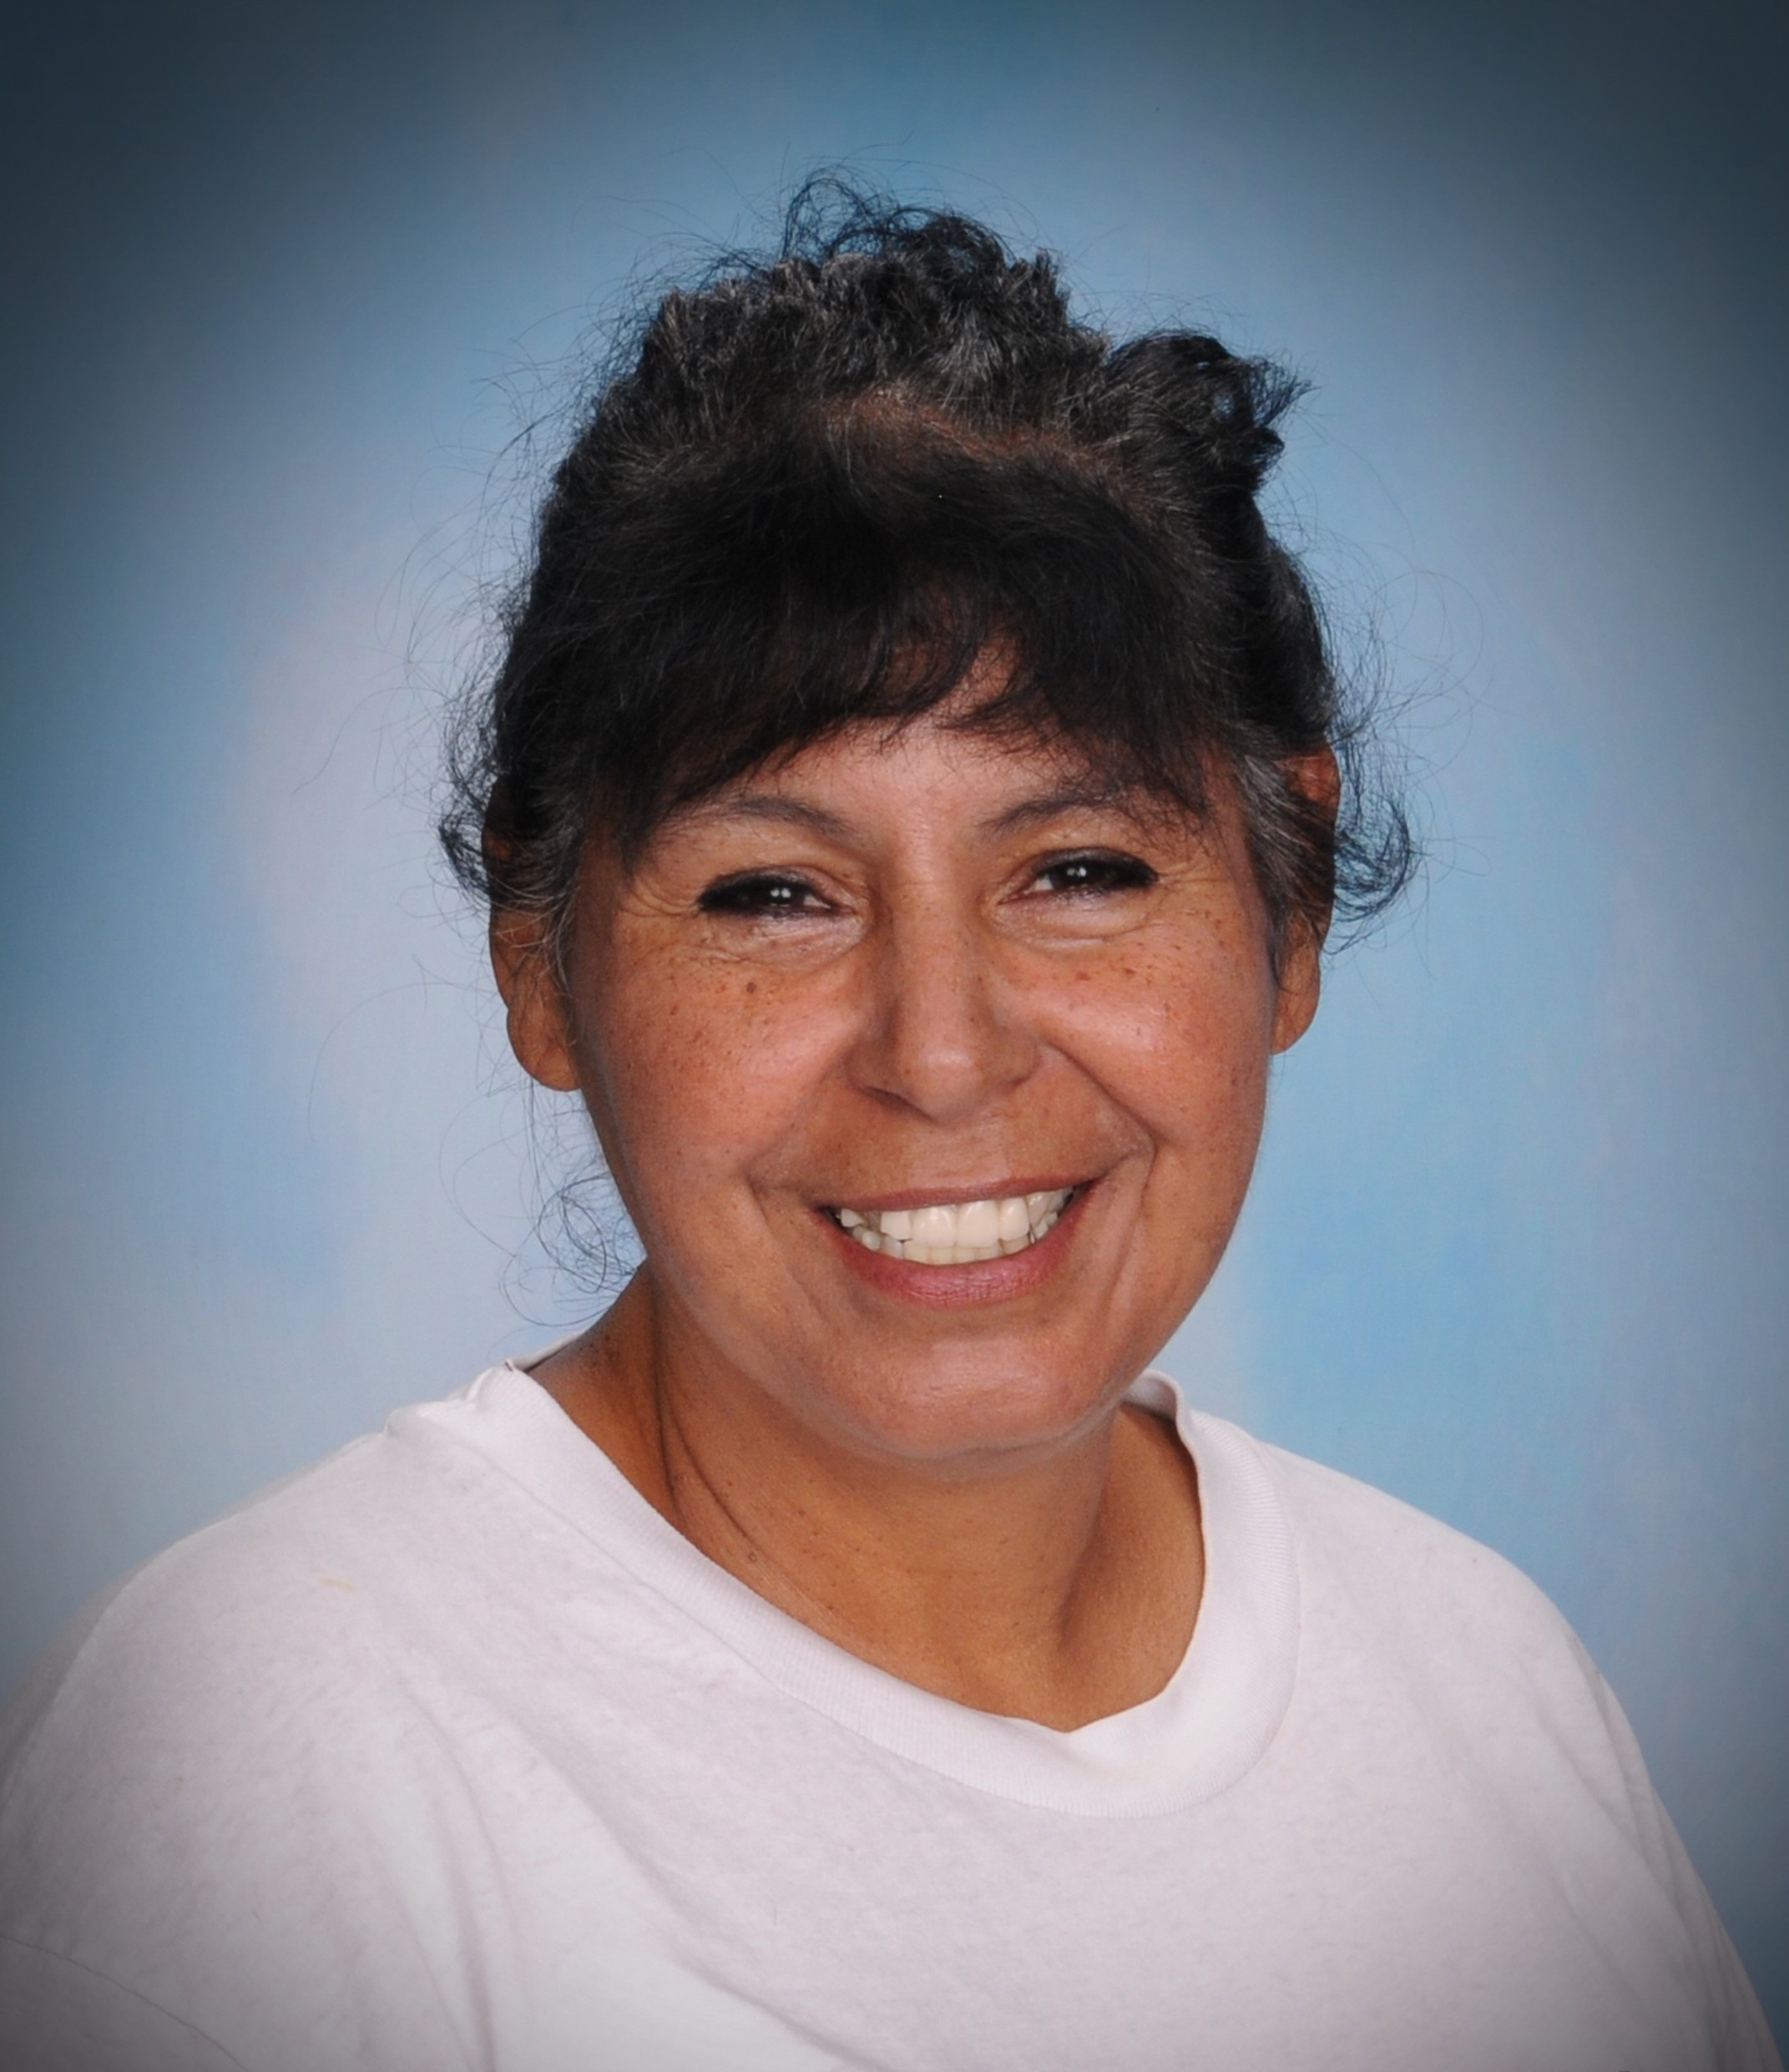 Oxnard City Council District 4 Candidate Lucy Cartagena